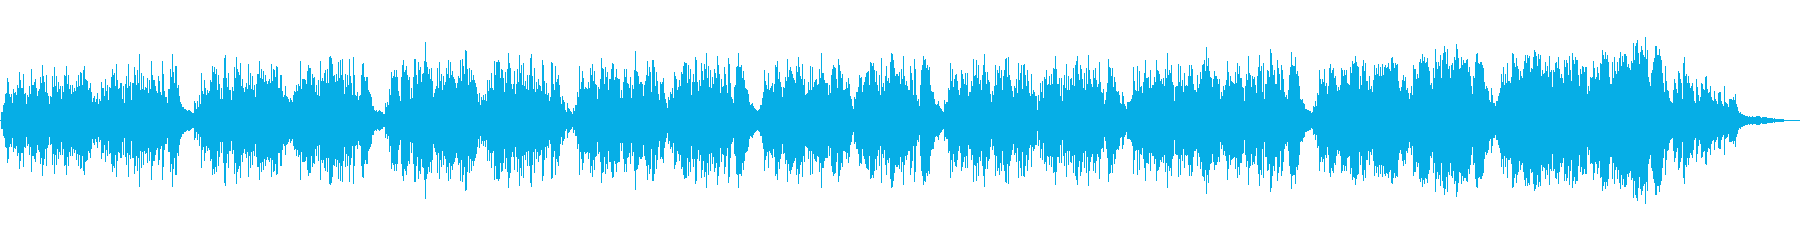 Togire Togireの再生済みの波形